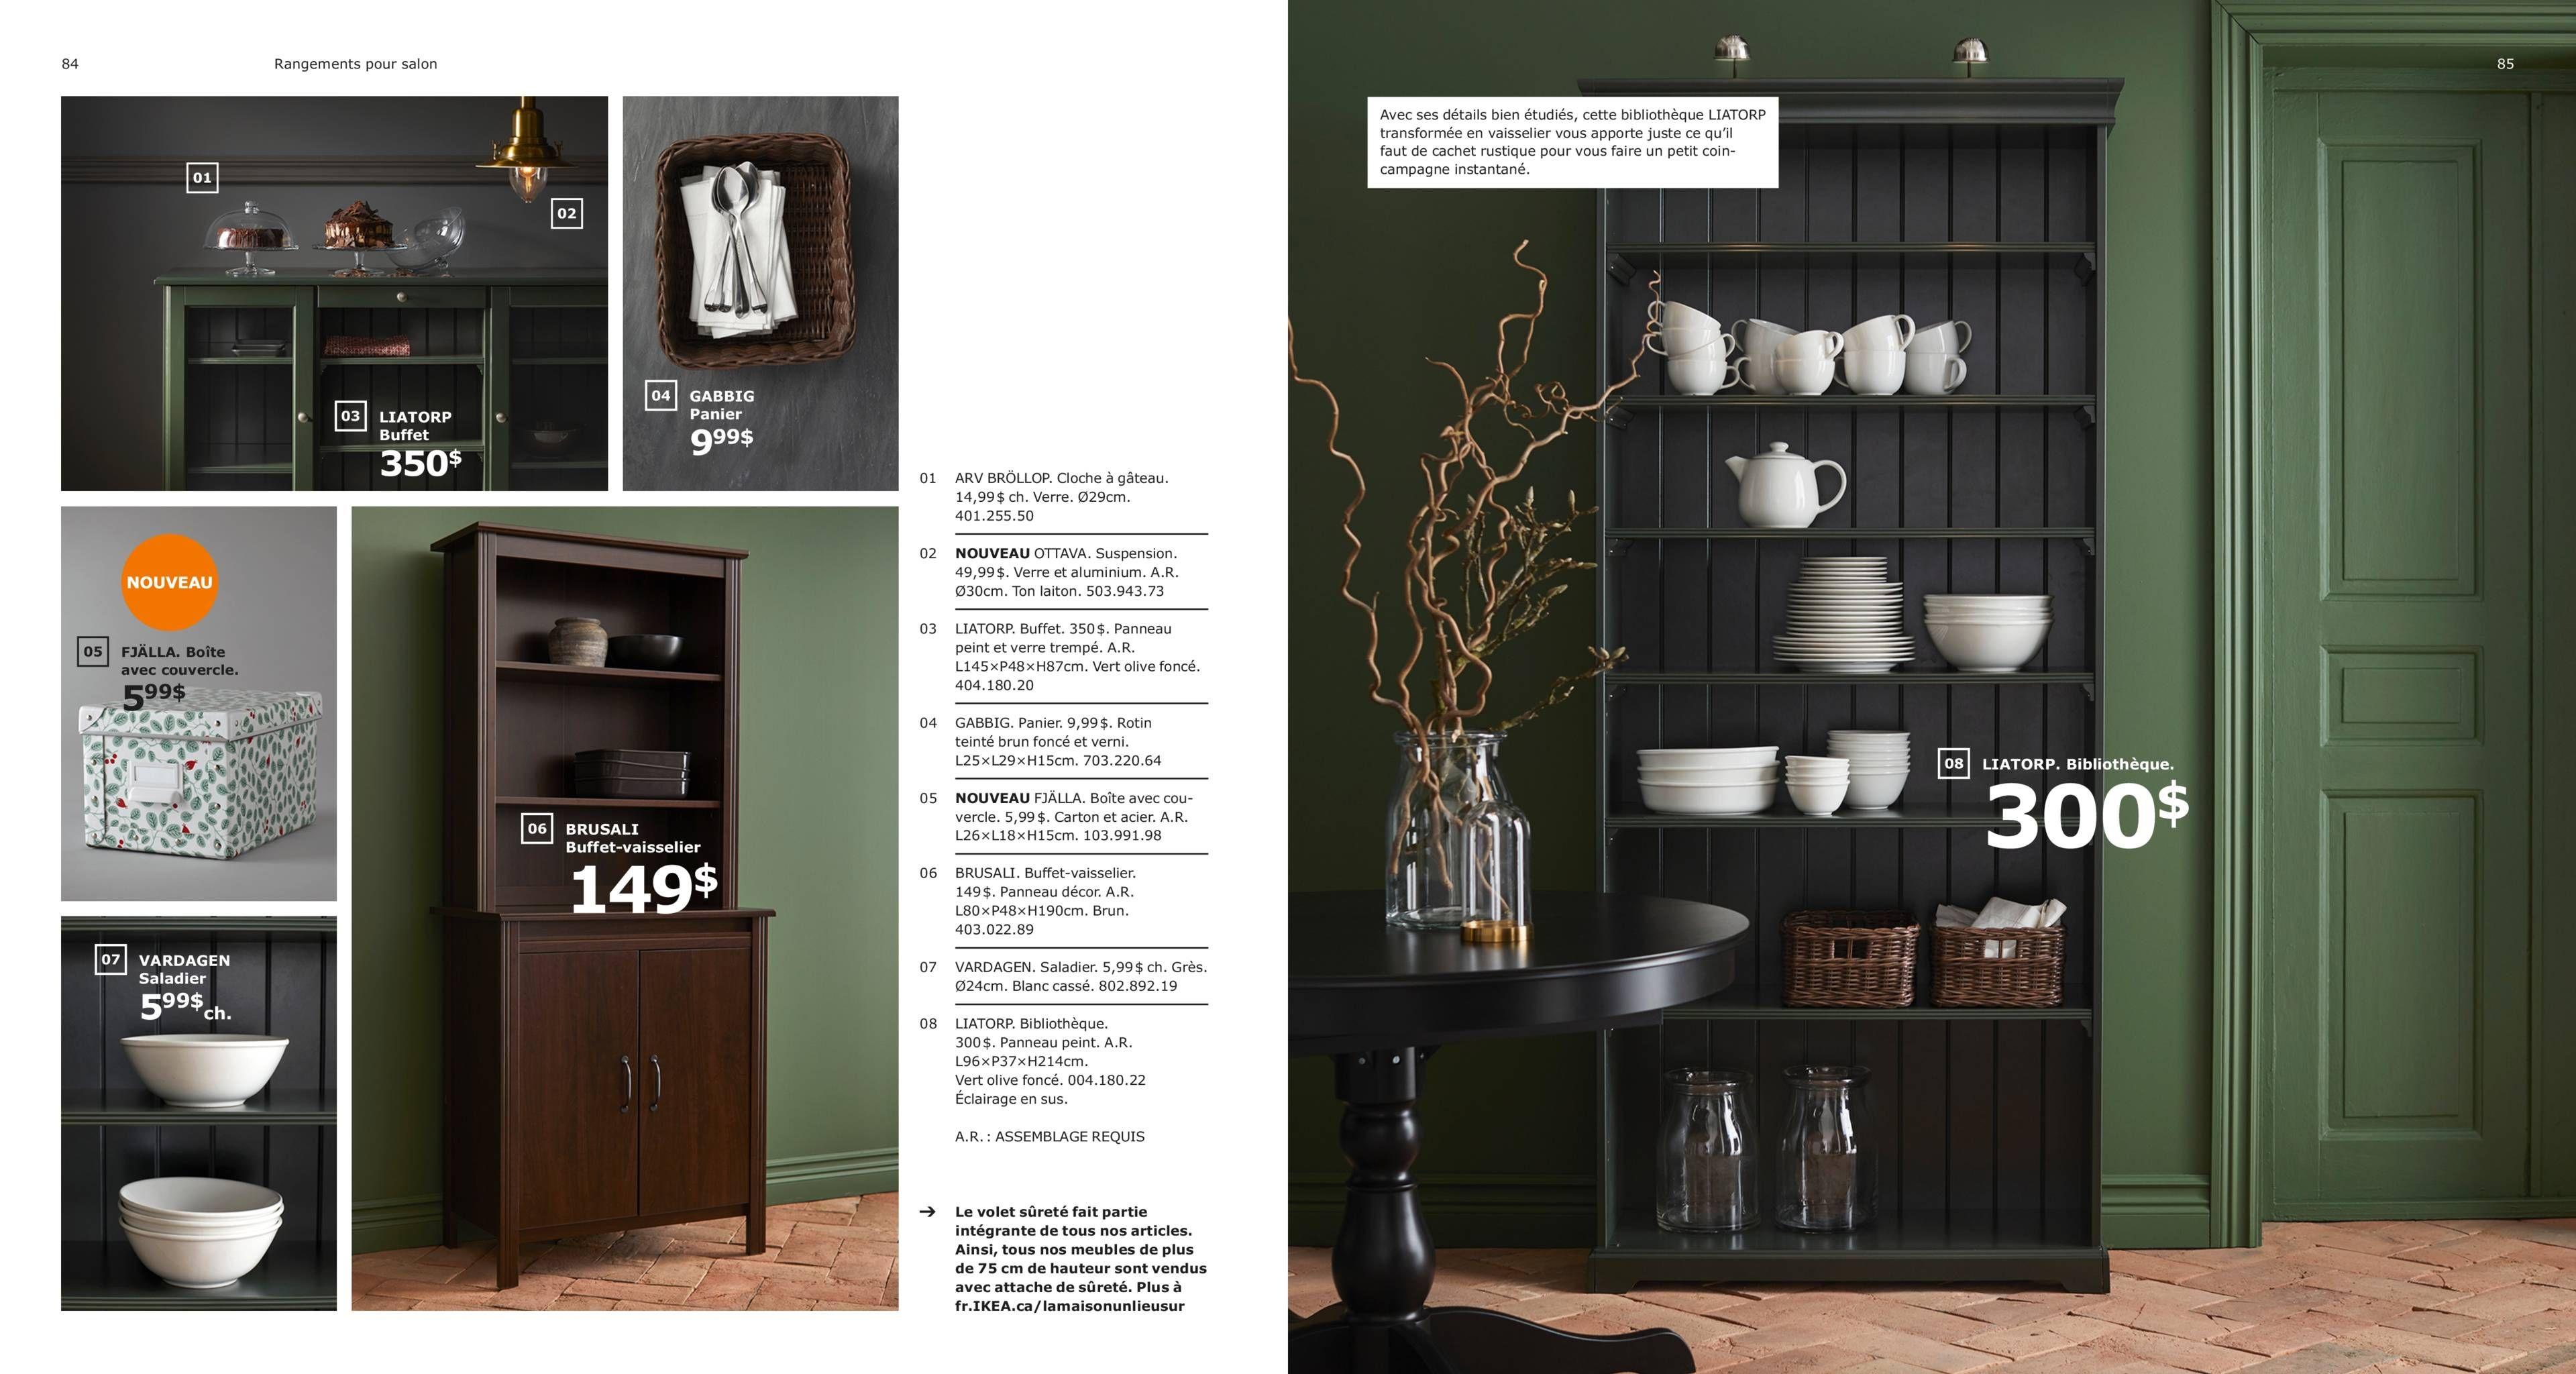 Rangements Pour Salon Catalogue Ikea 2019 Ikea Catalog Ikea Best Home Interior Design